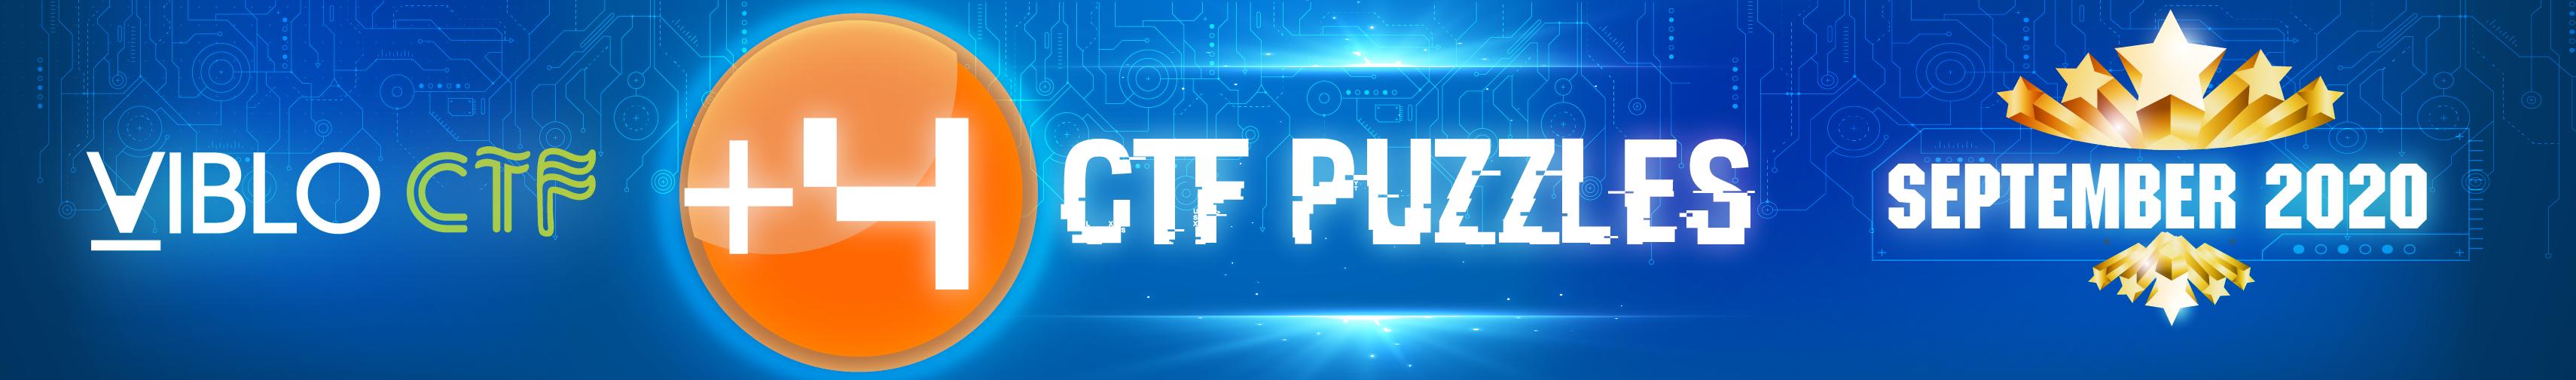 Viblo CTF - New puzzles 202009